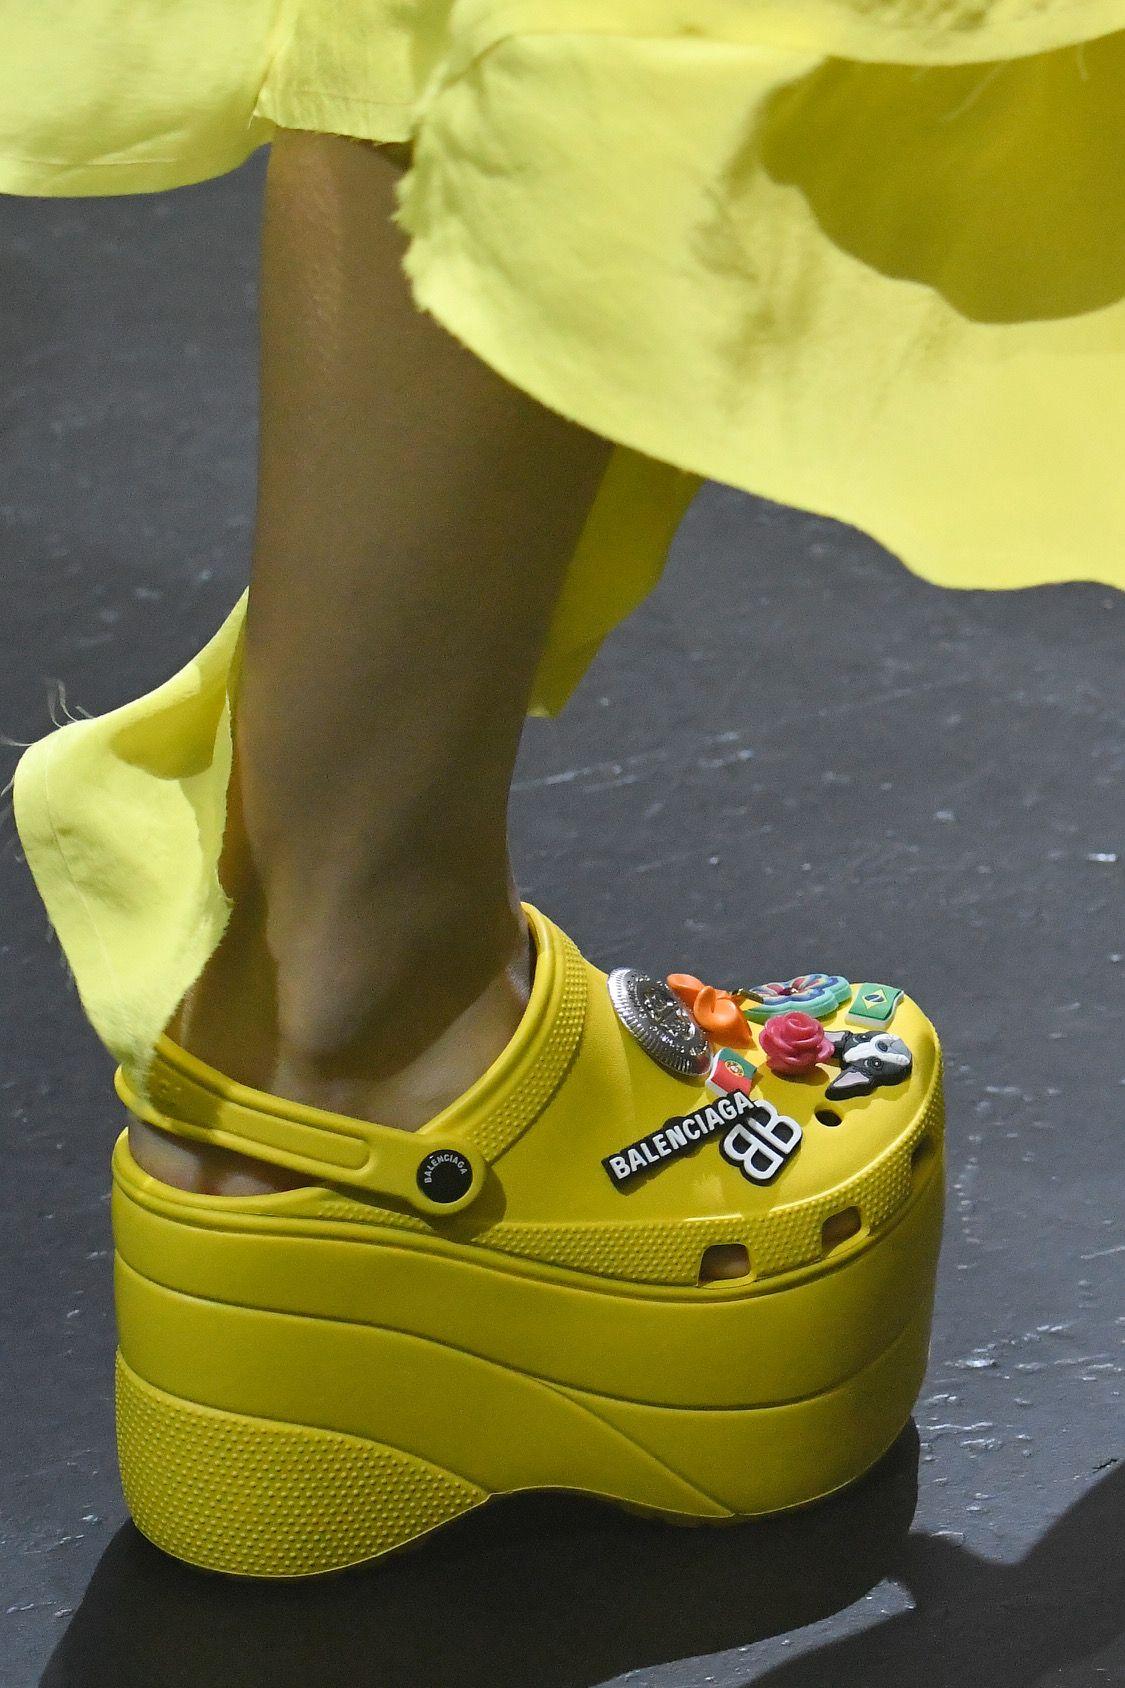 Balenciaga Introduces Platform Crocs